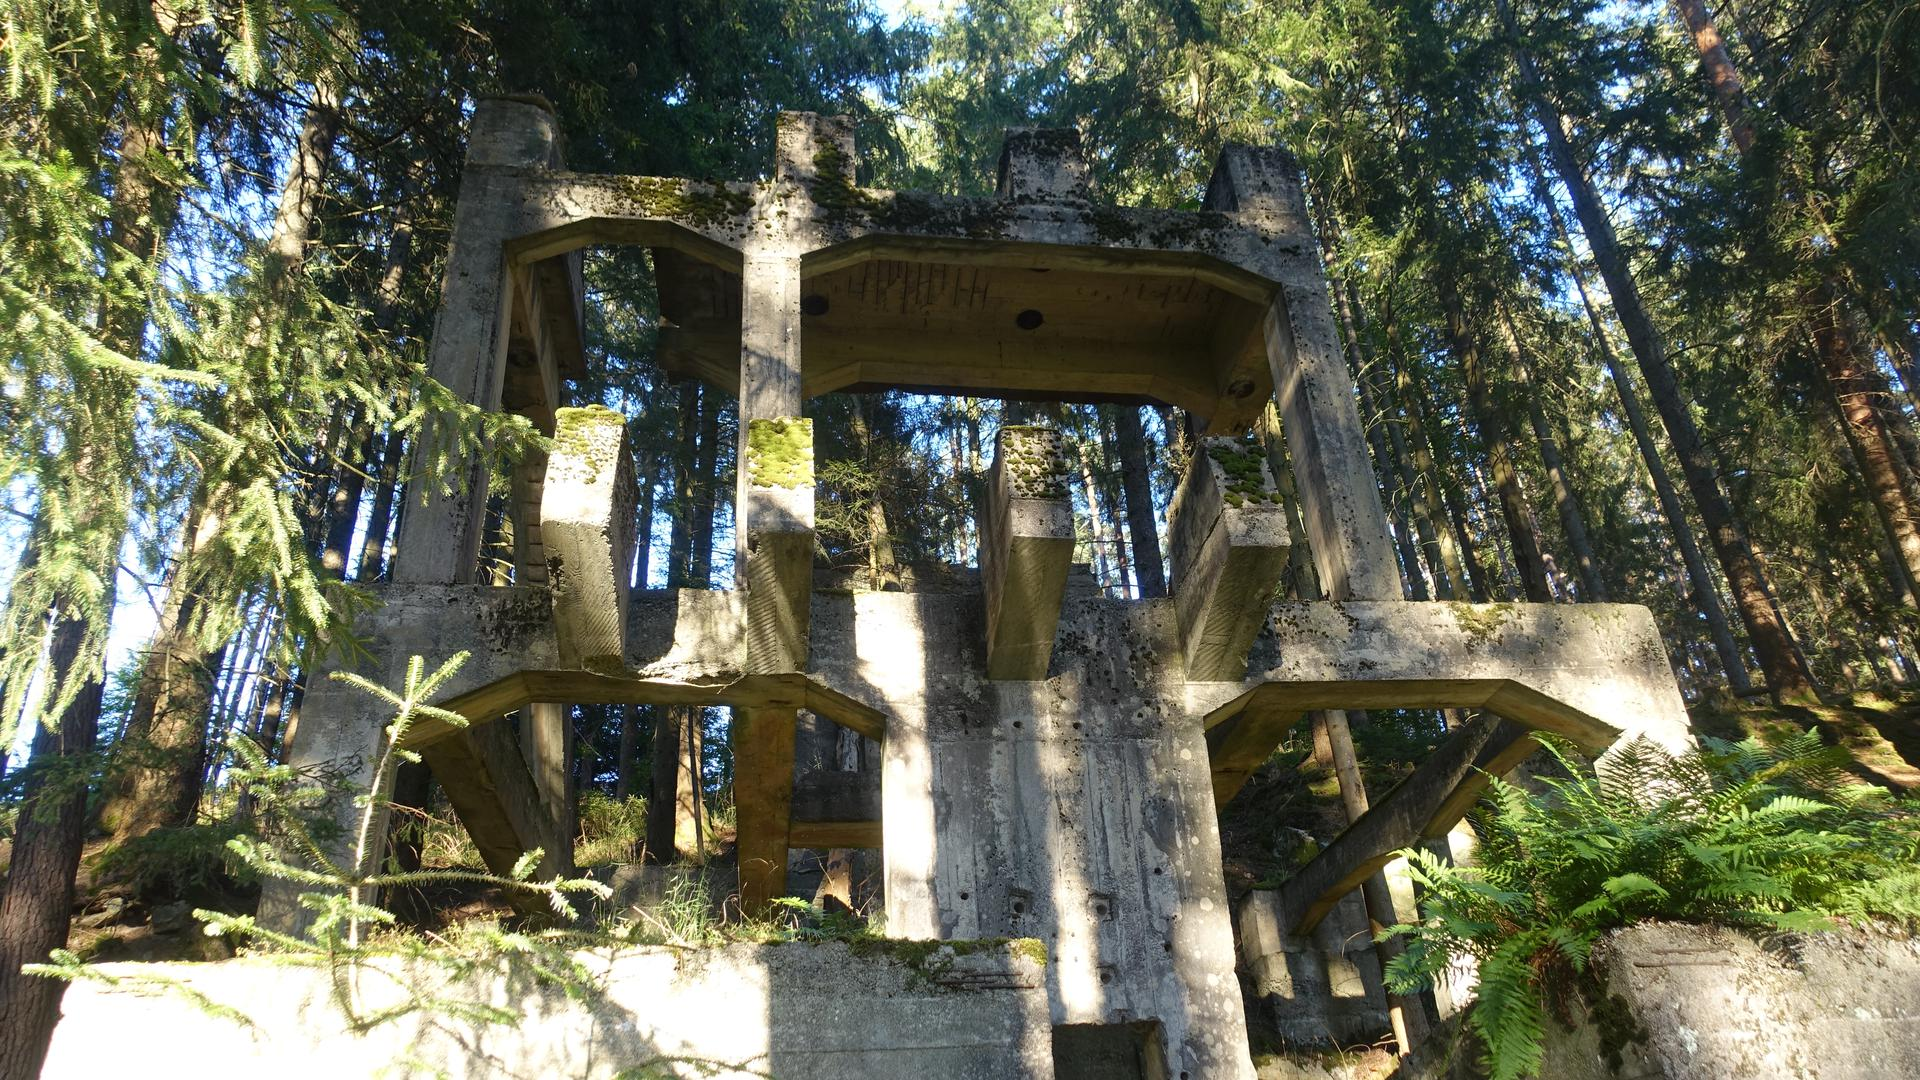 Betonskelett im Wald Schneidersköpfle Schwarzenbachtalsperre Bau